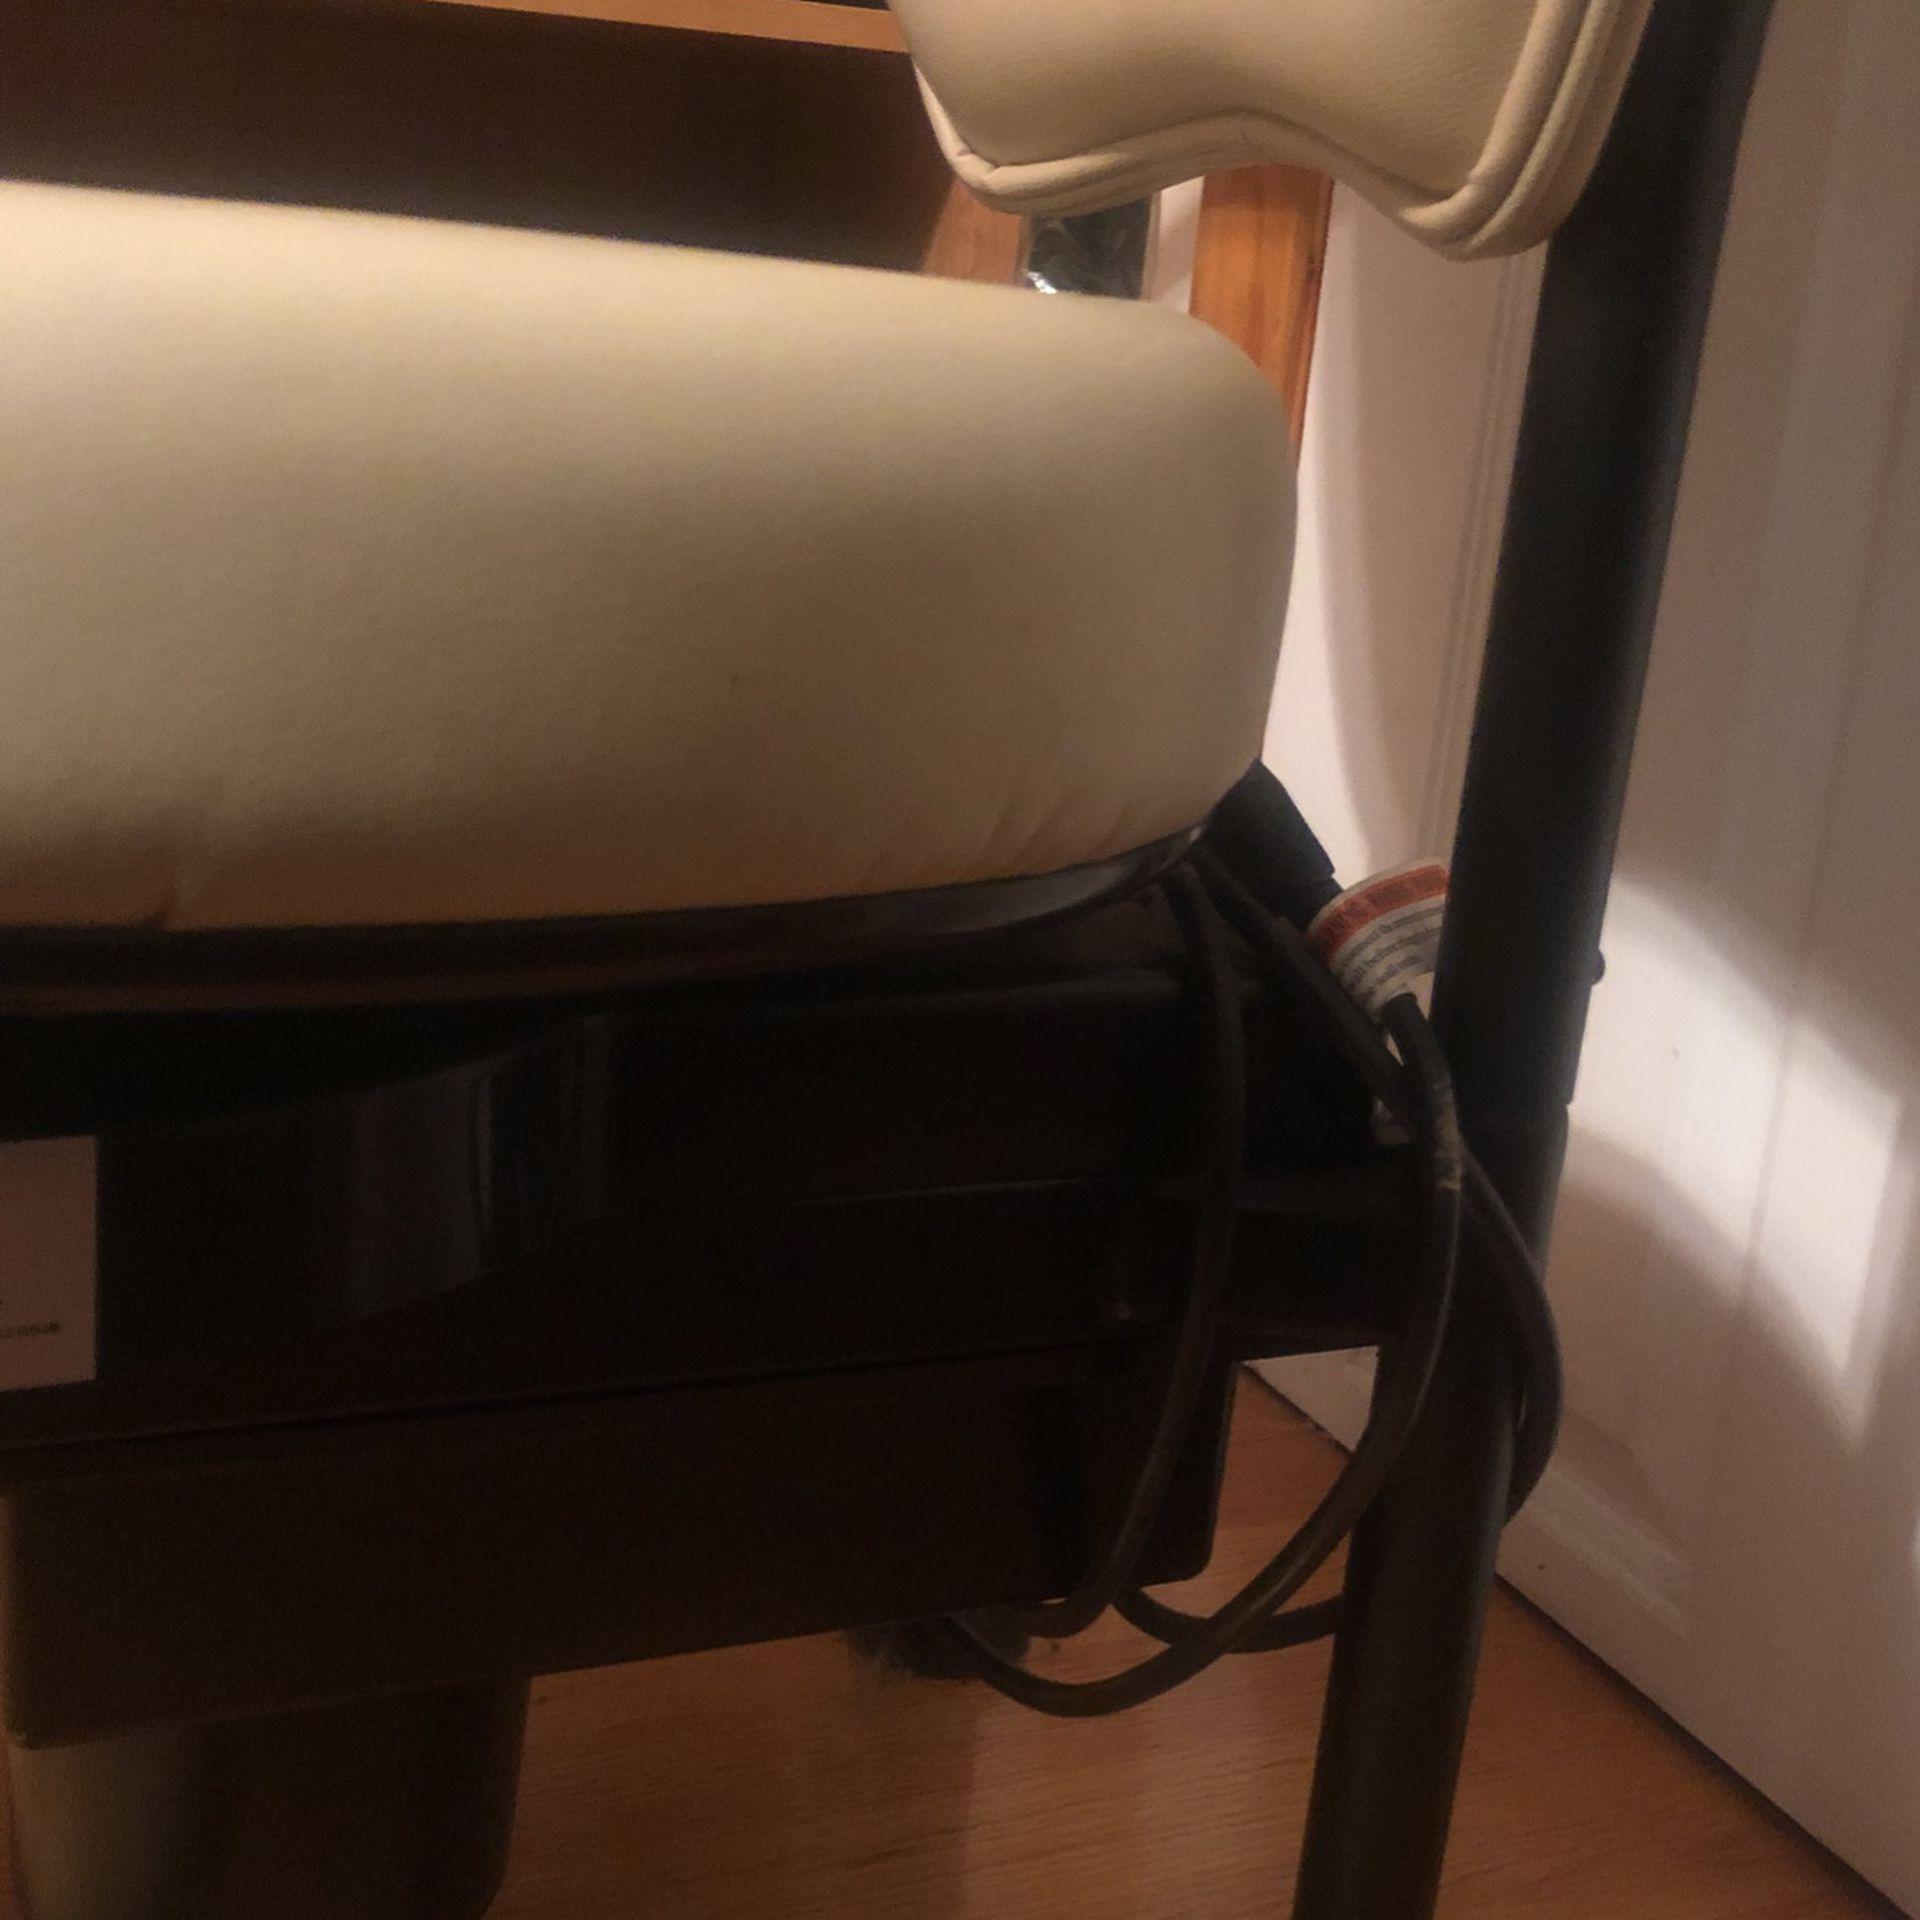 Sport Hula chair Exerciser, Abdominal Exercise chair Hawaii BZ-668